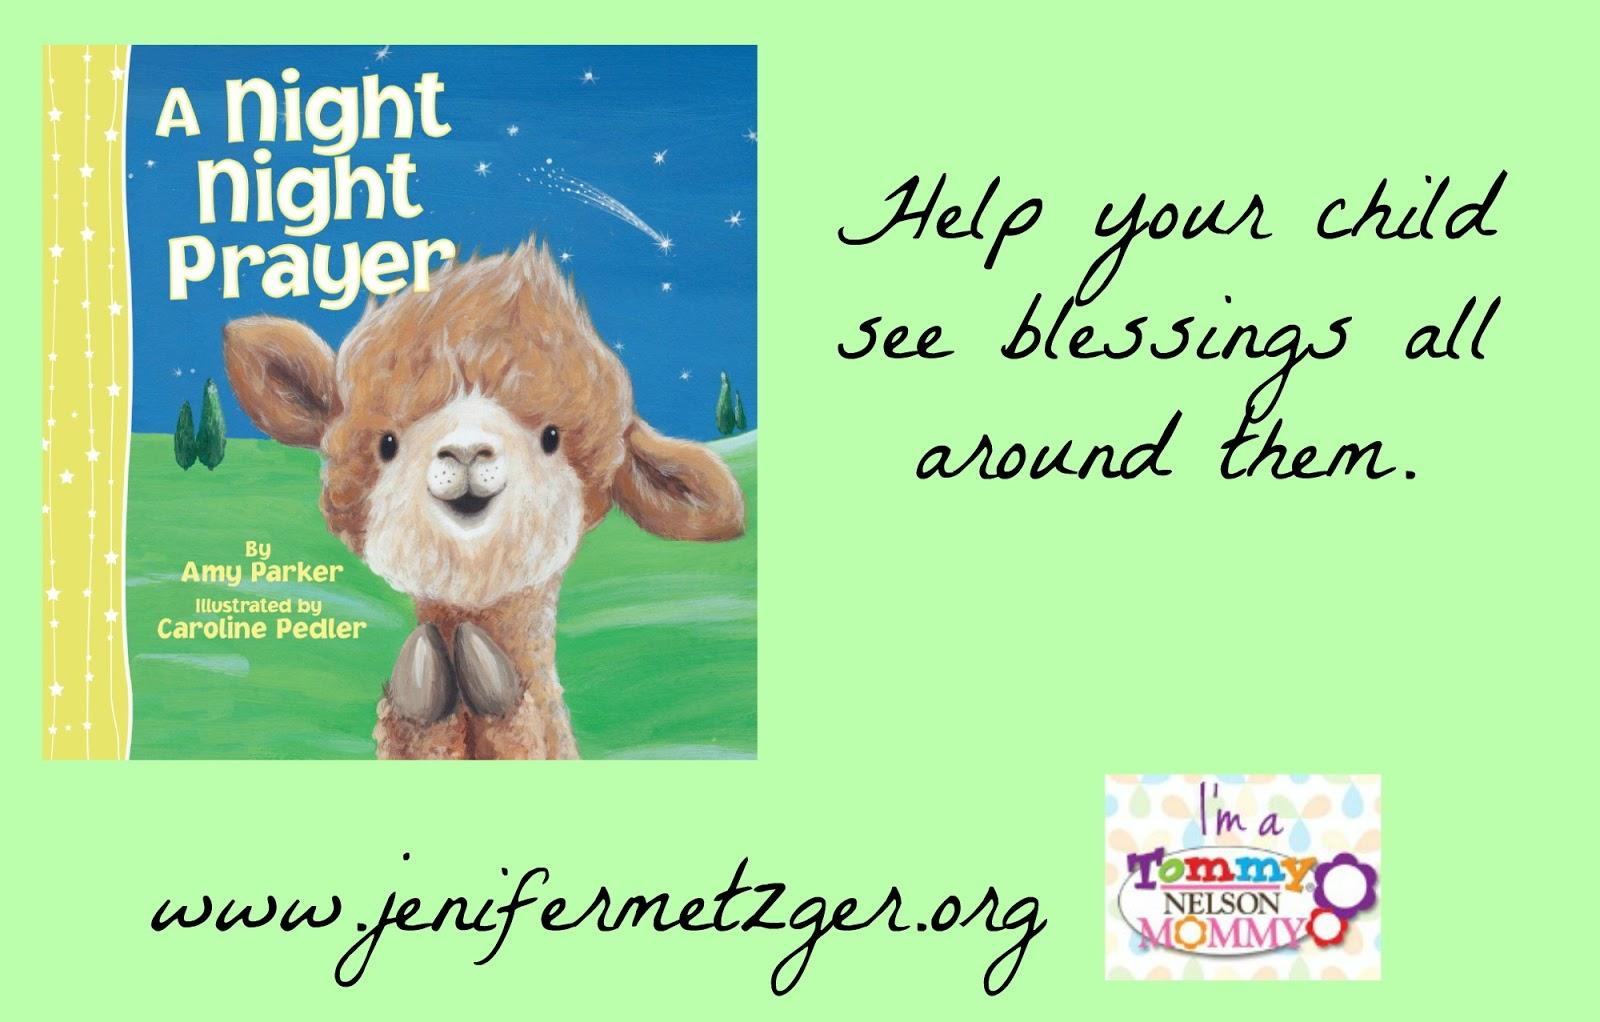 A Night Night #Prayer. #children #tommymommy